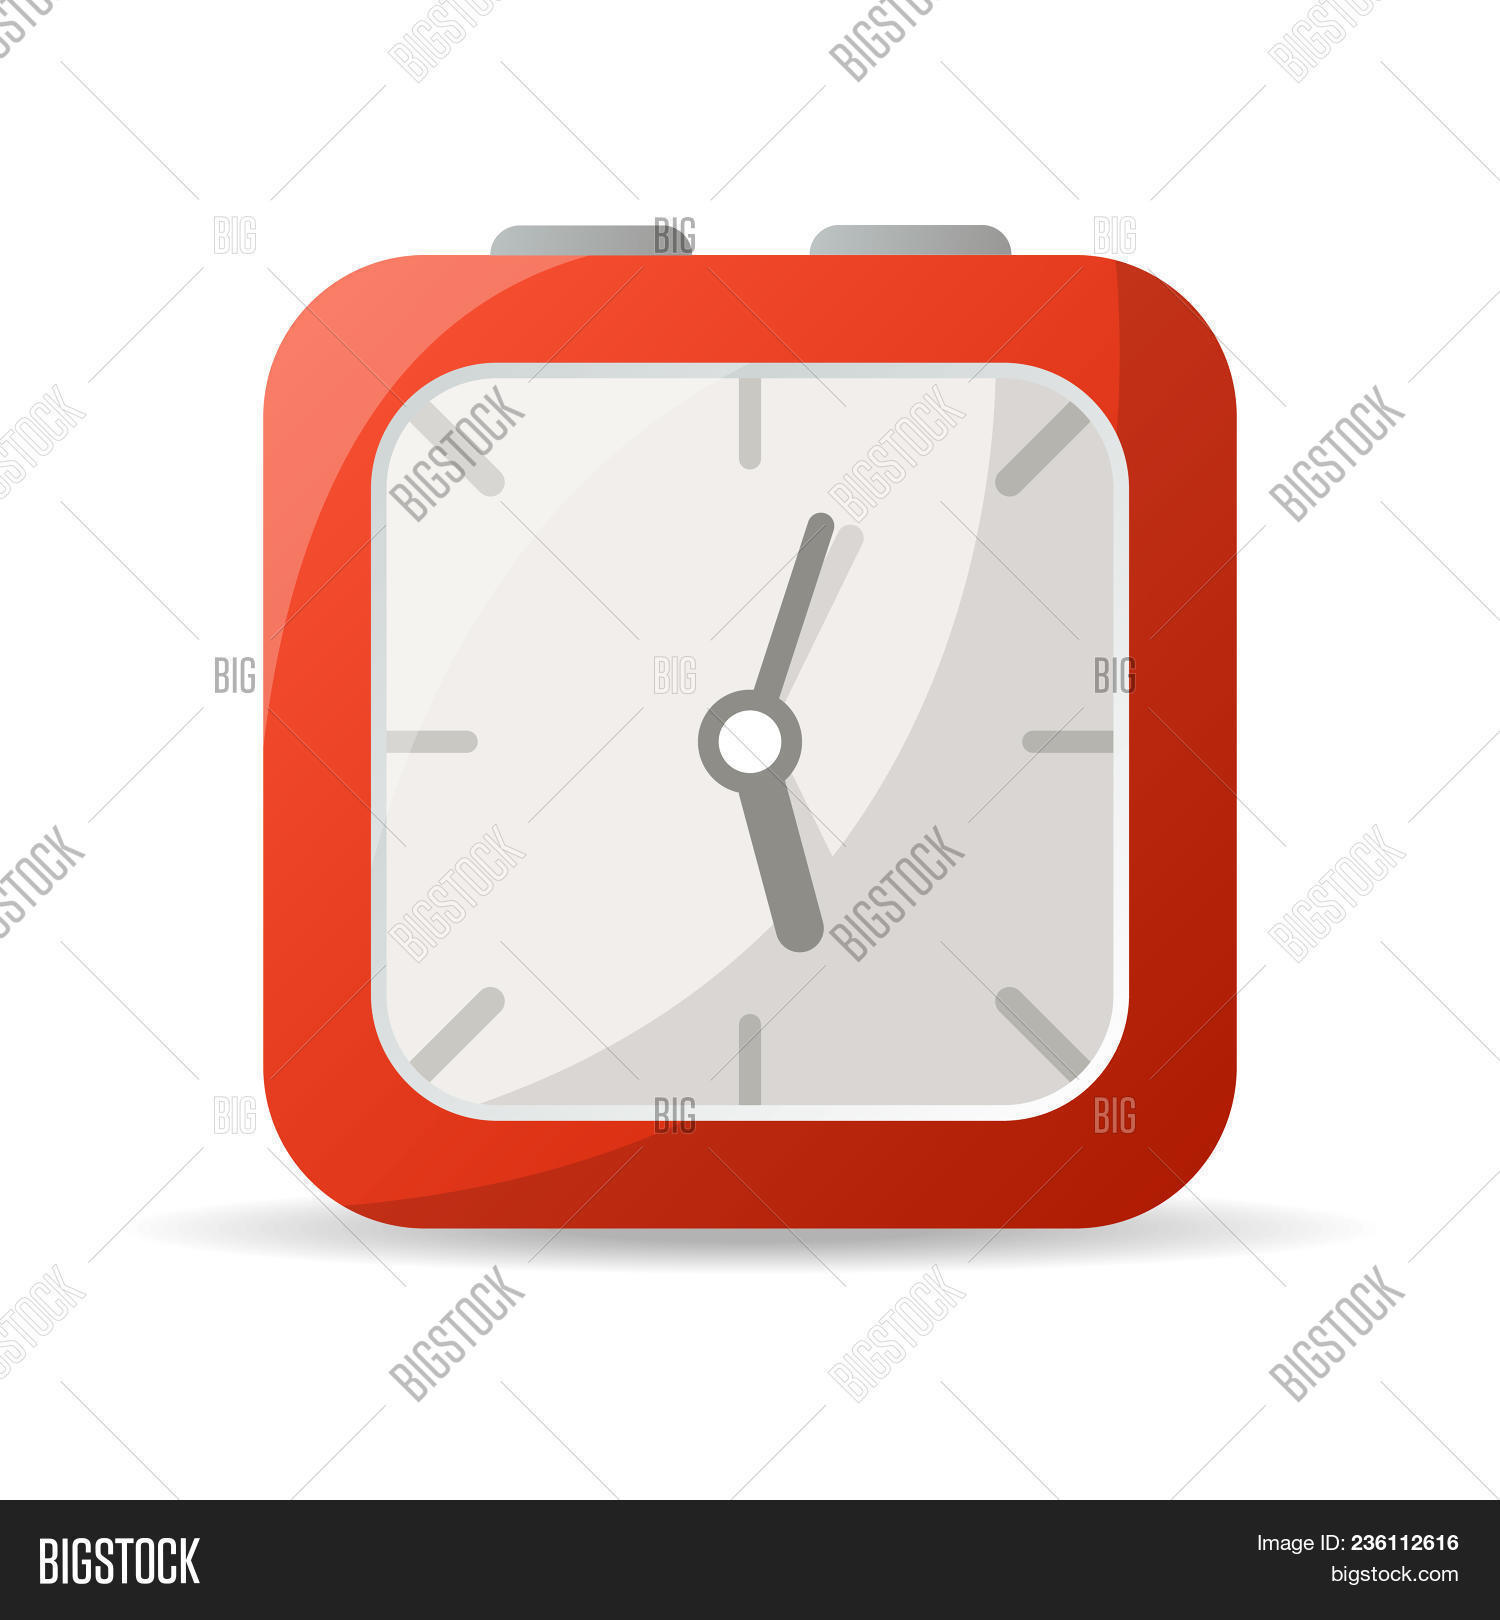 Red Analog Clock Icon Image & Photo (Free Trial)   Bigstock